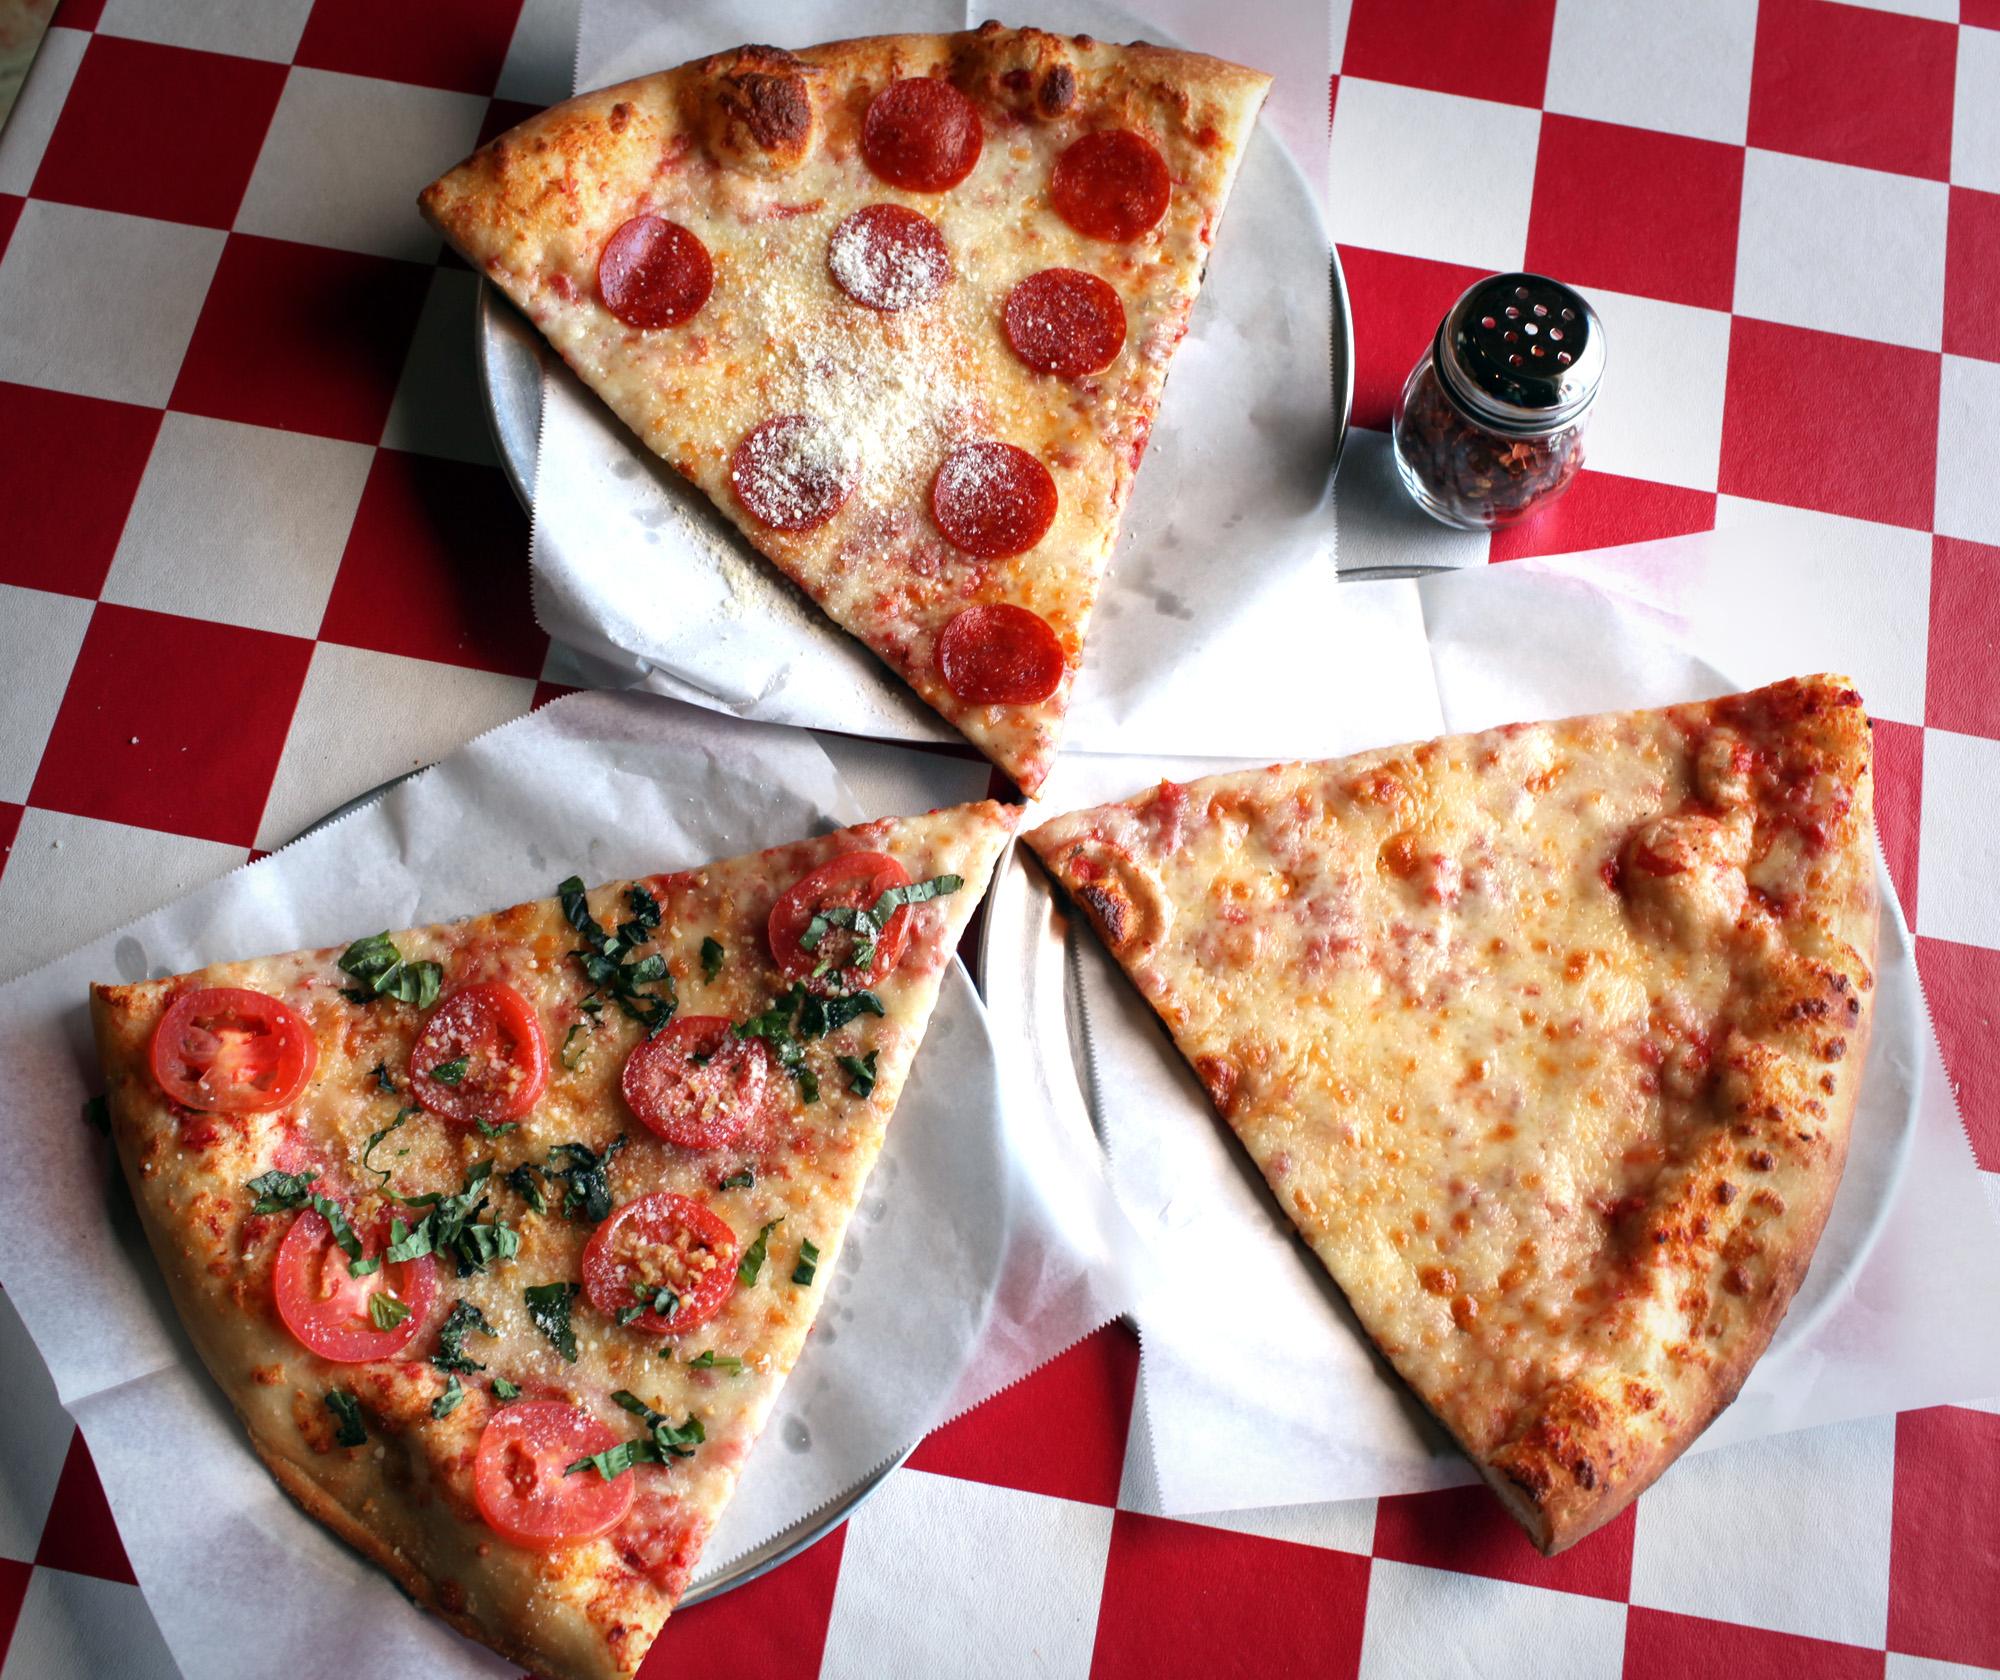 Julian S Pizzeria Plans New Location At Sunset Ridge San